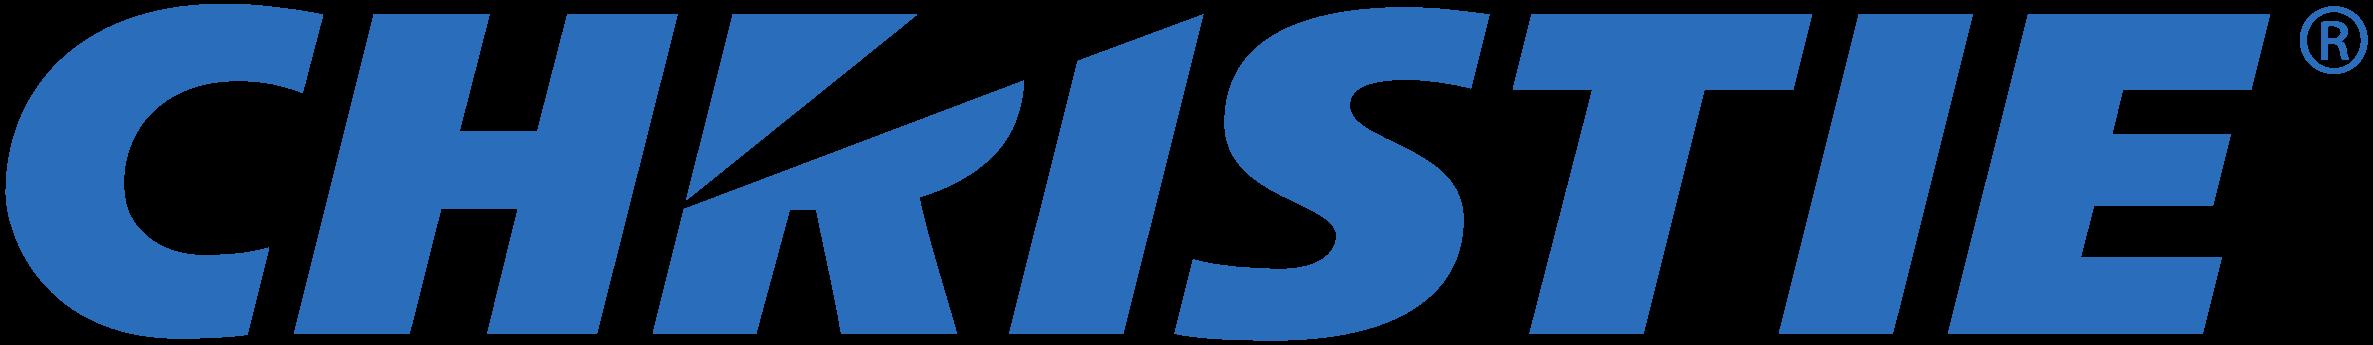 christie_logo